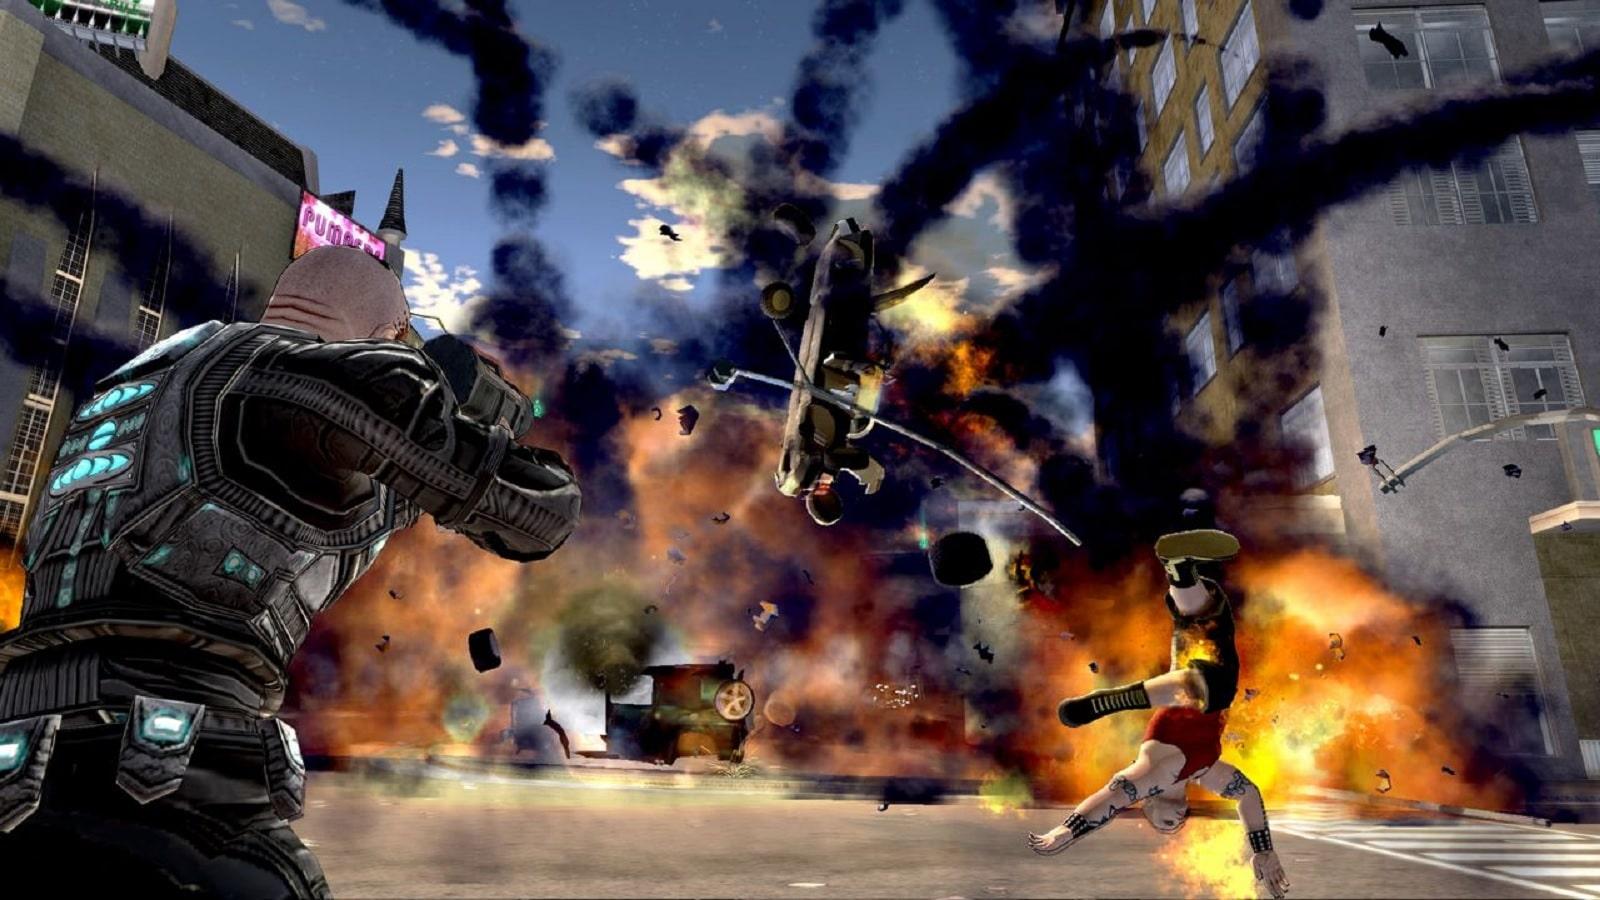 crackdown 1 gameplay